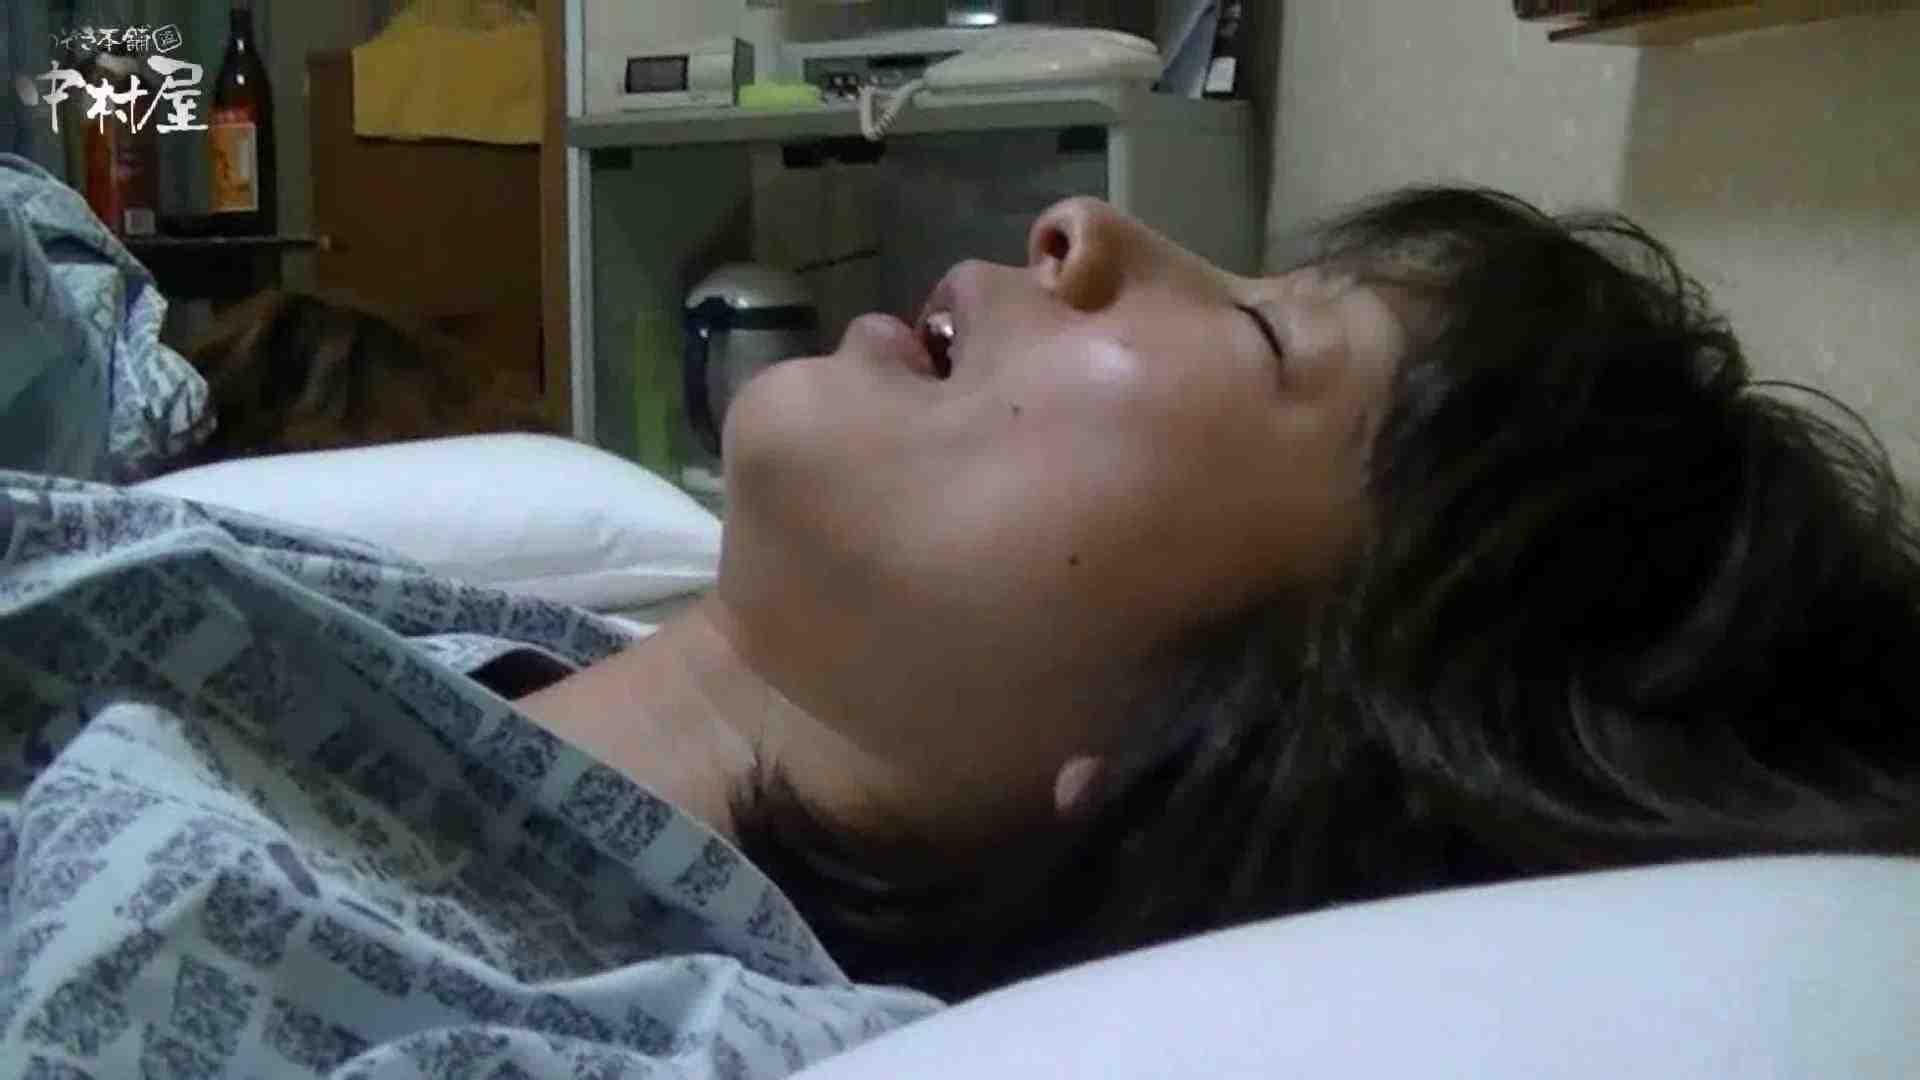 ネムリ姫 vol.42 前編 鬼畜 盗撮動画紹介 9枚 5